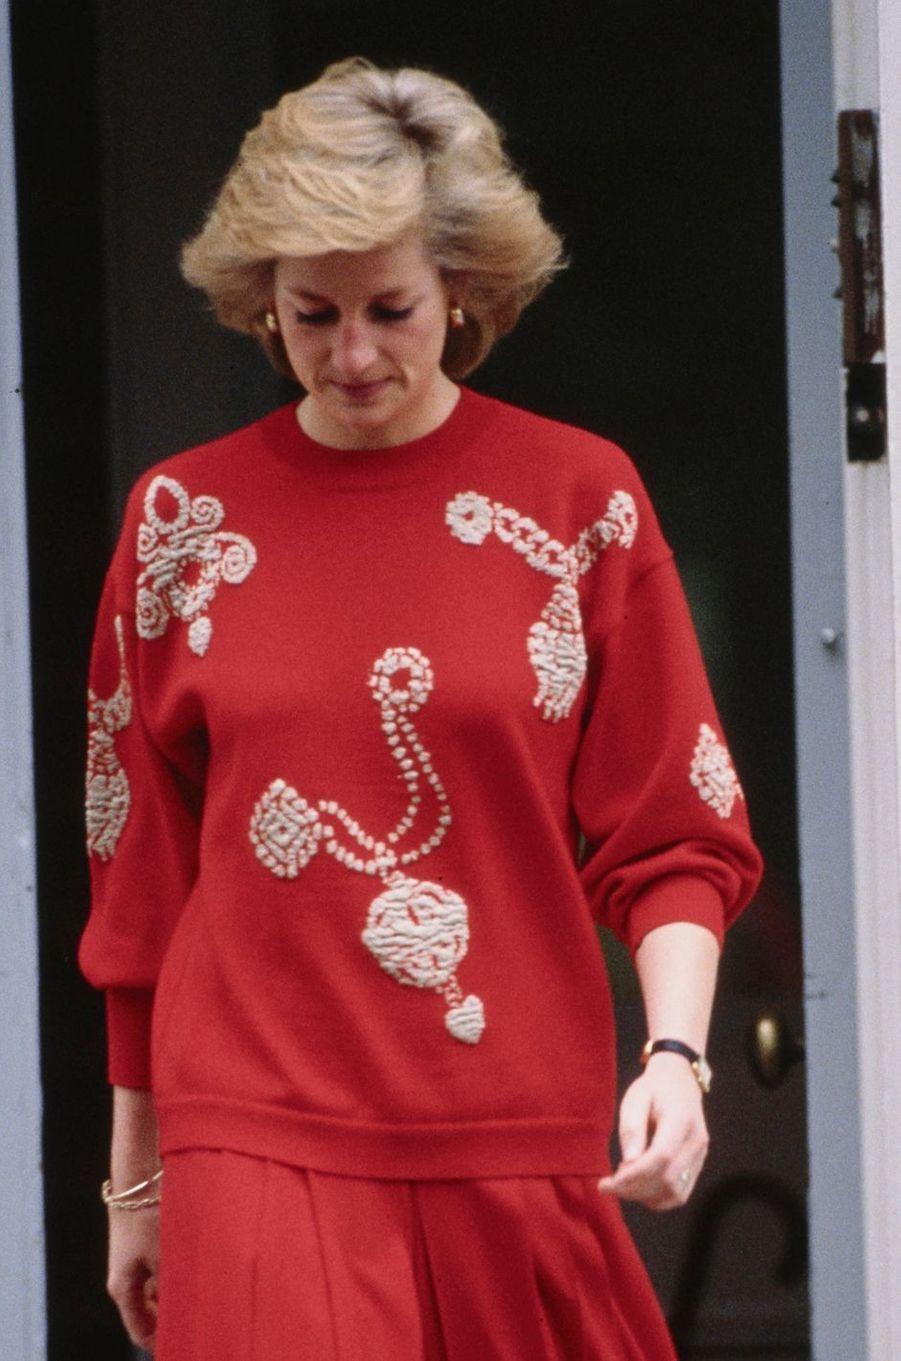 Le pull de la princesse Diana, en septembre 1989